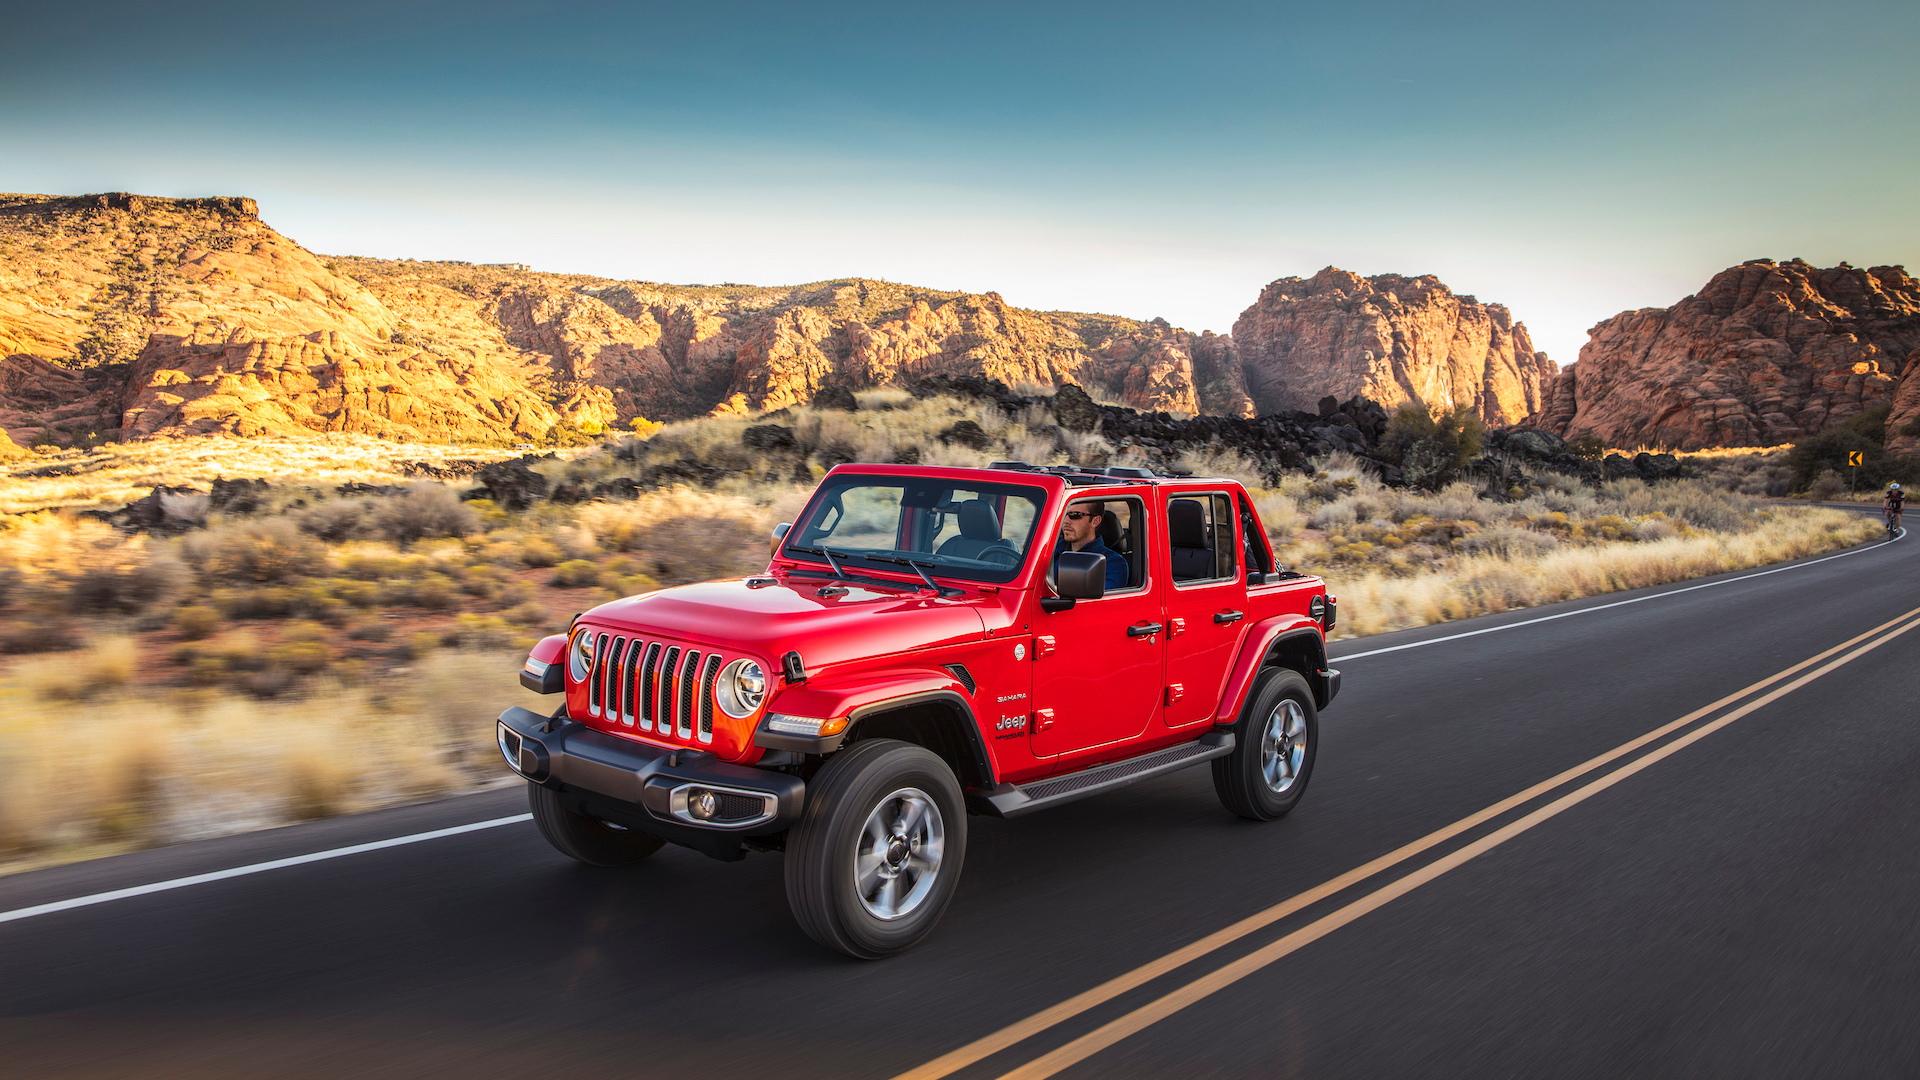 2020 Jeep Wrangler Sahara EcoDiesel